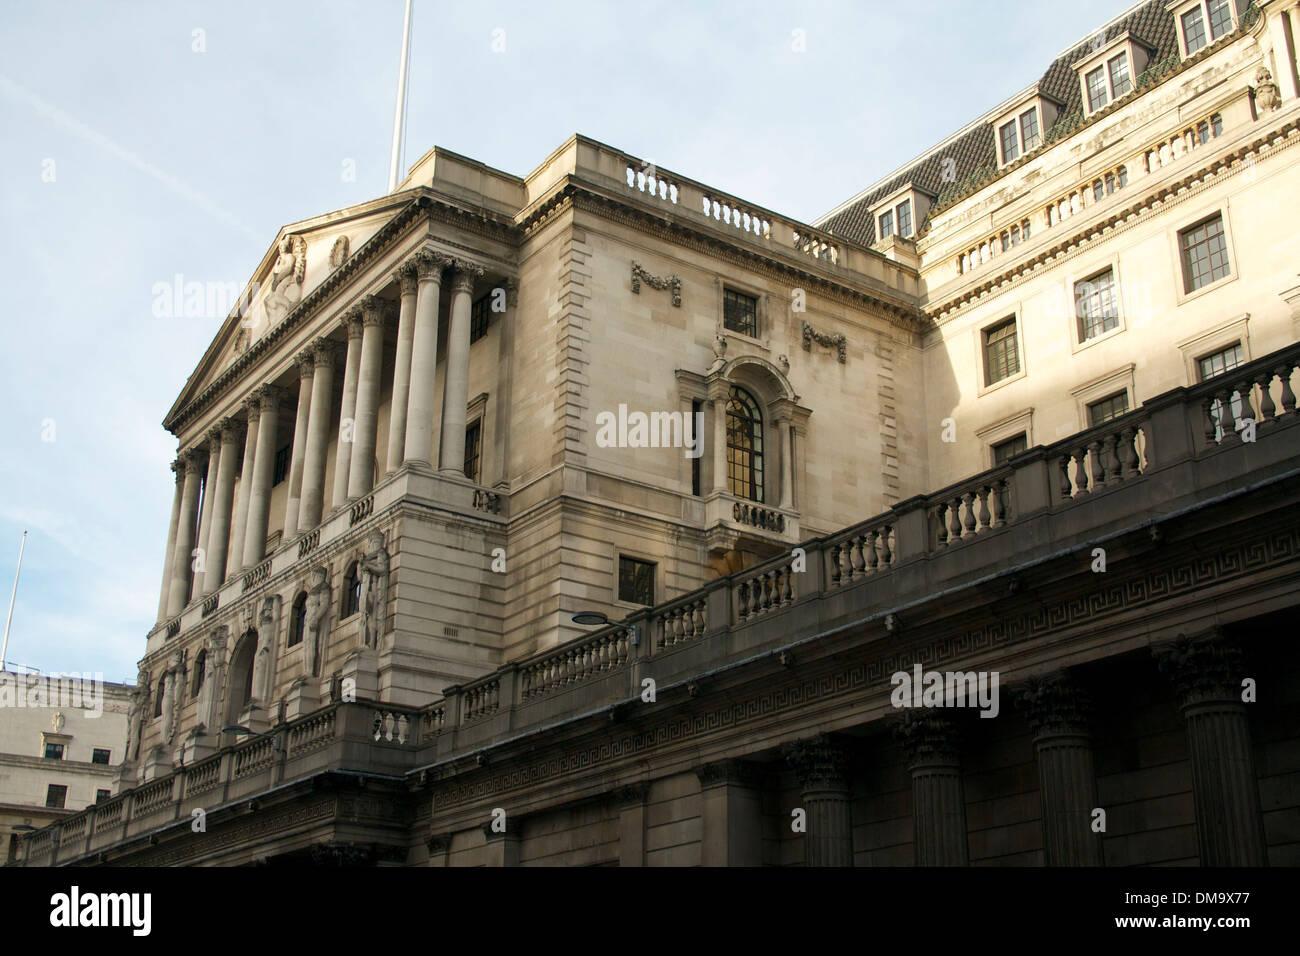 The Bank of England, London, UK - Stock Image